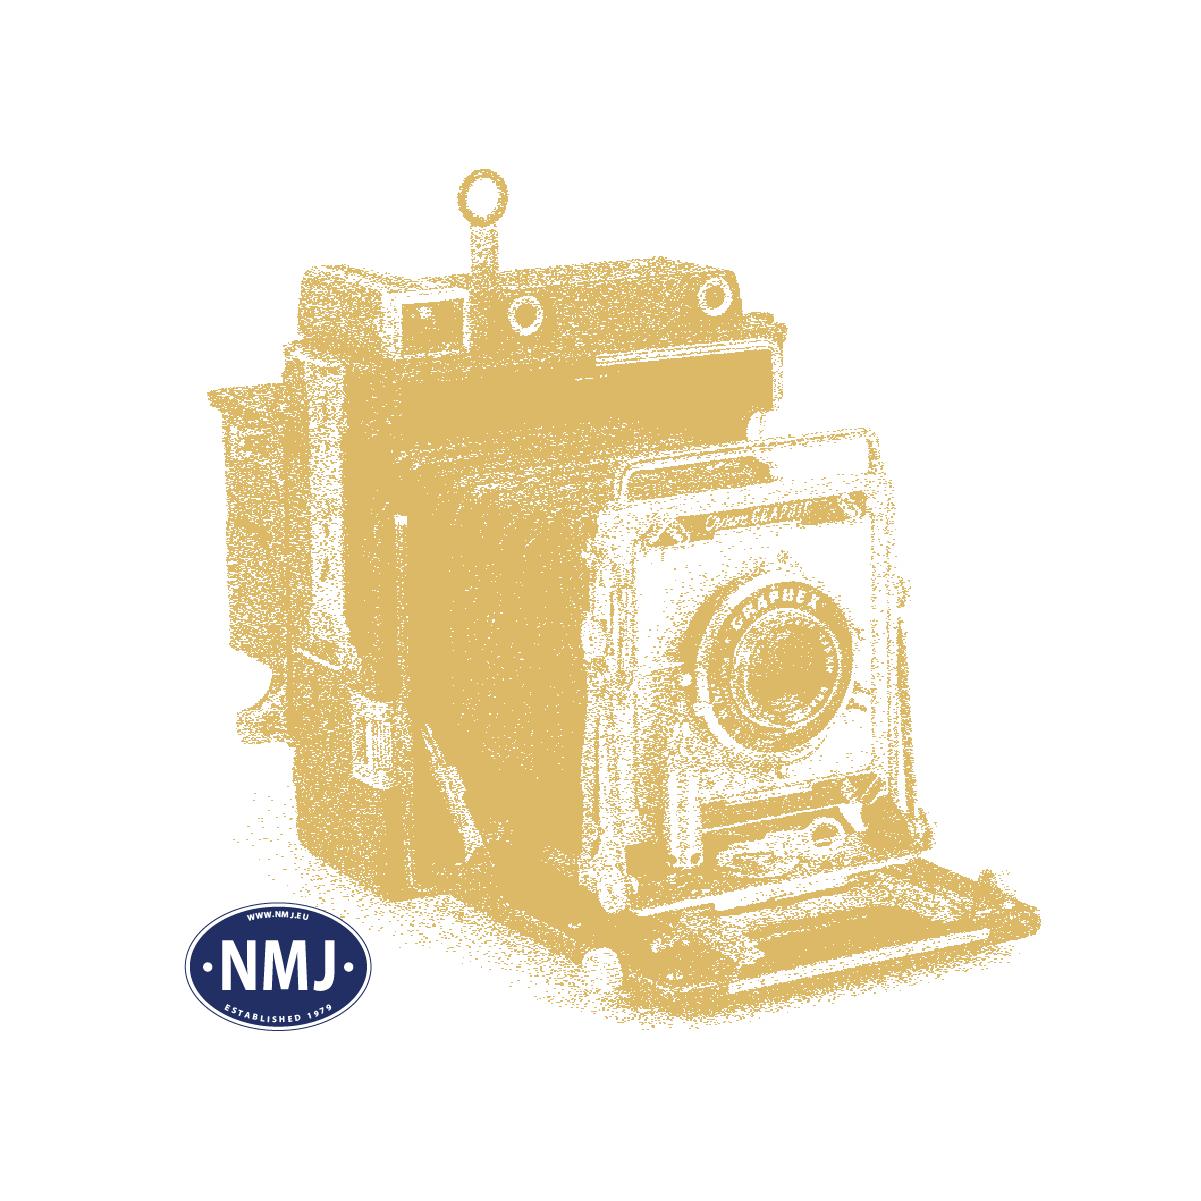 DK-8750064 - CFL Mx 1023, DCC m/ Lyd